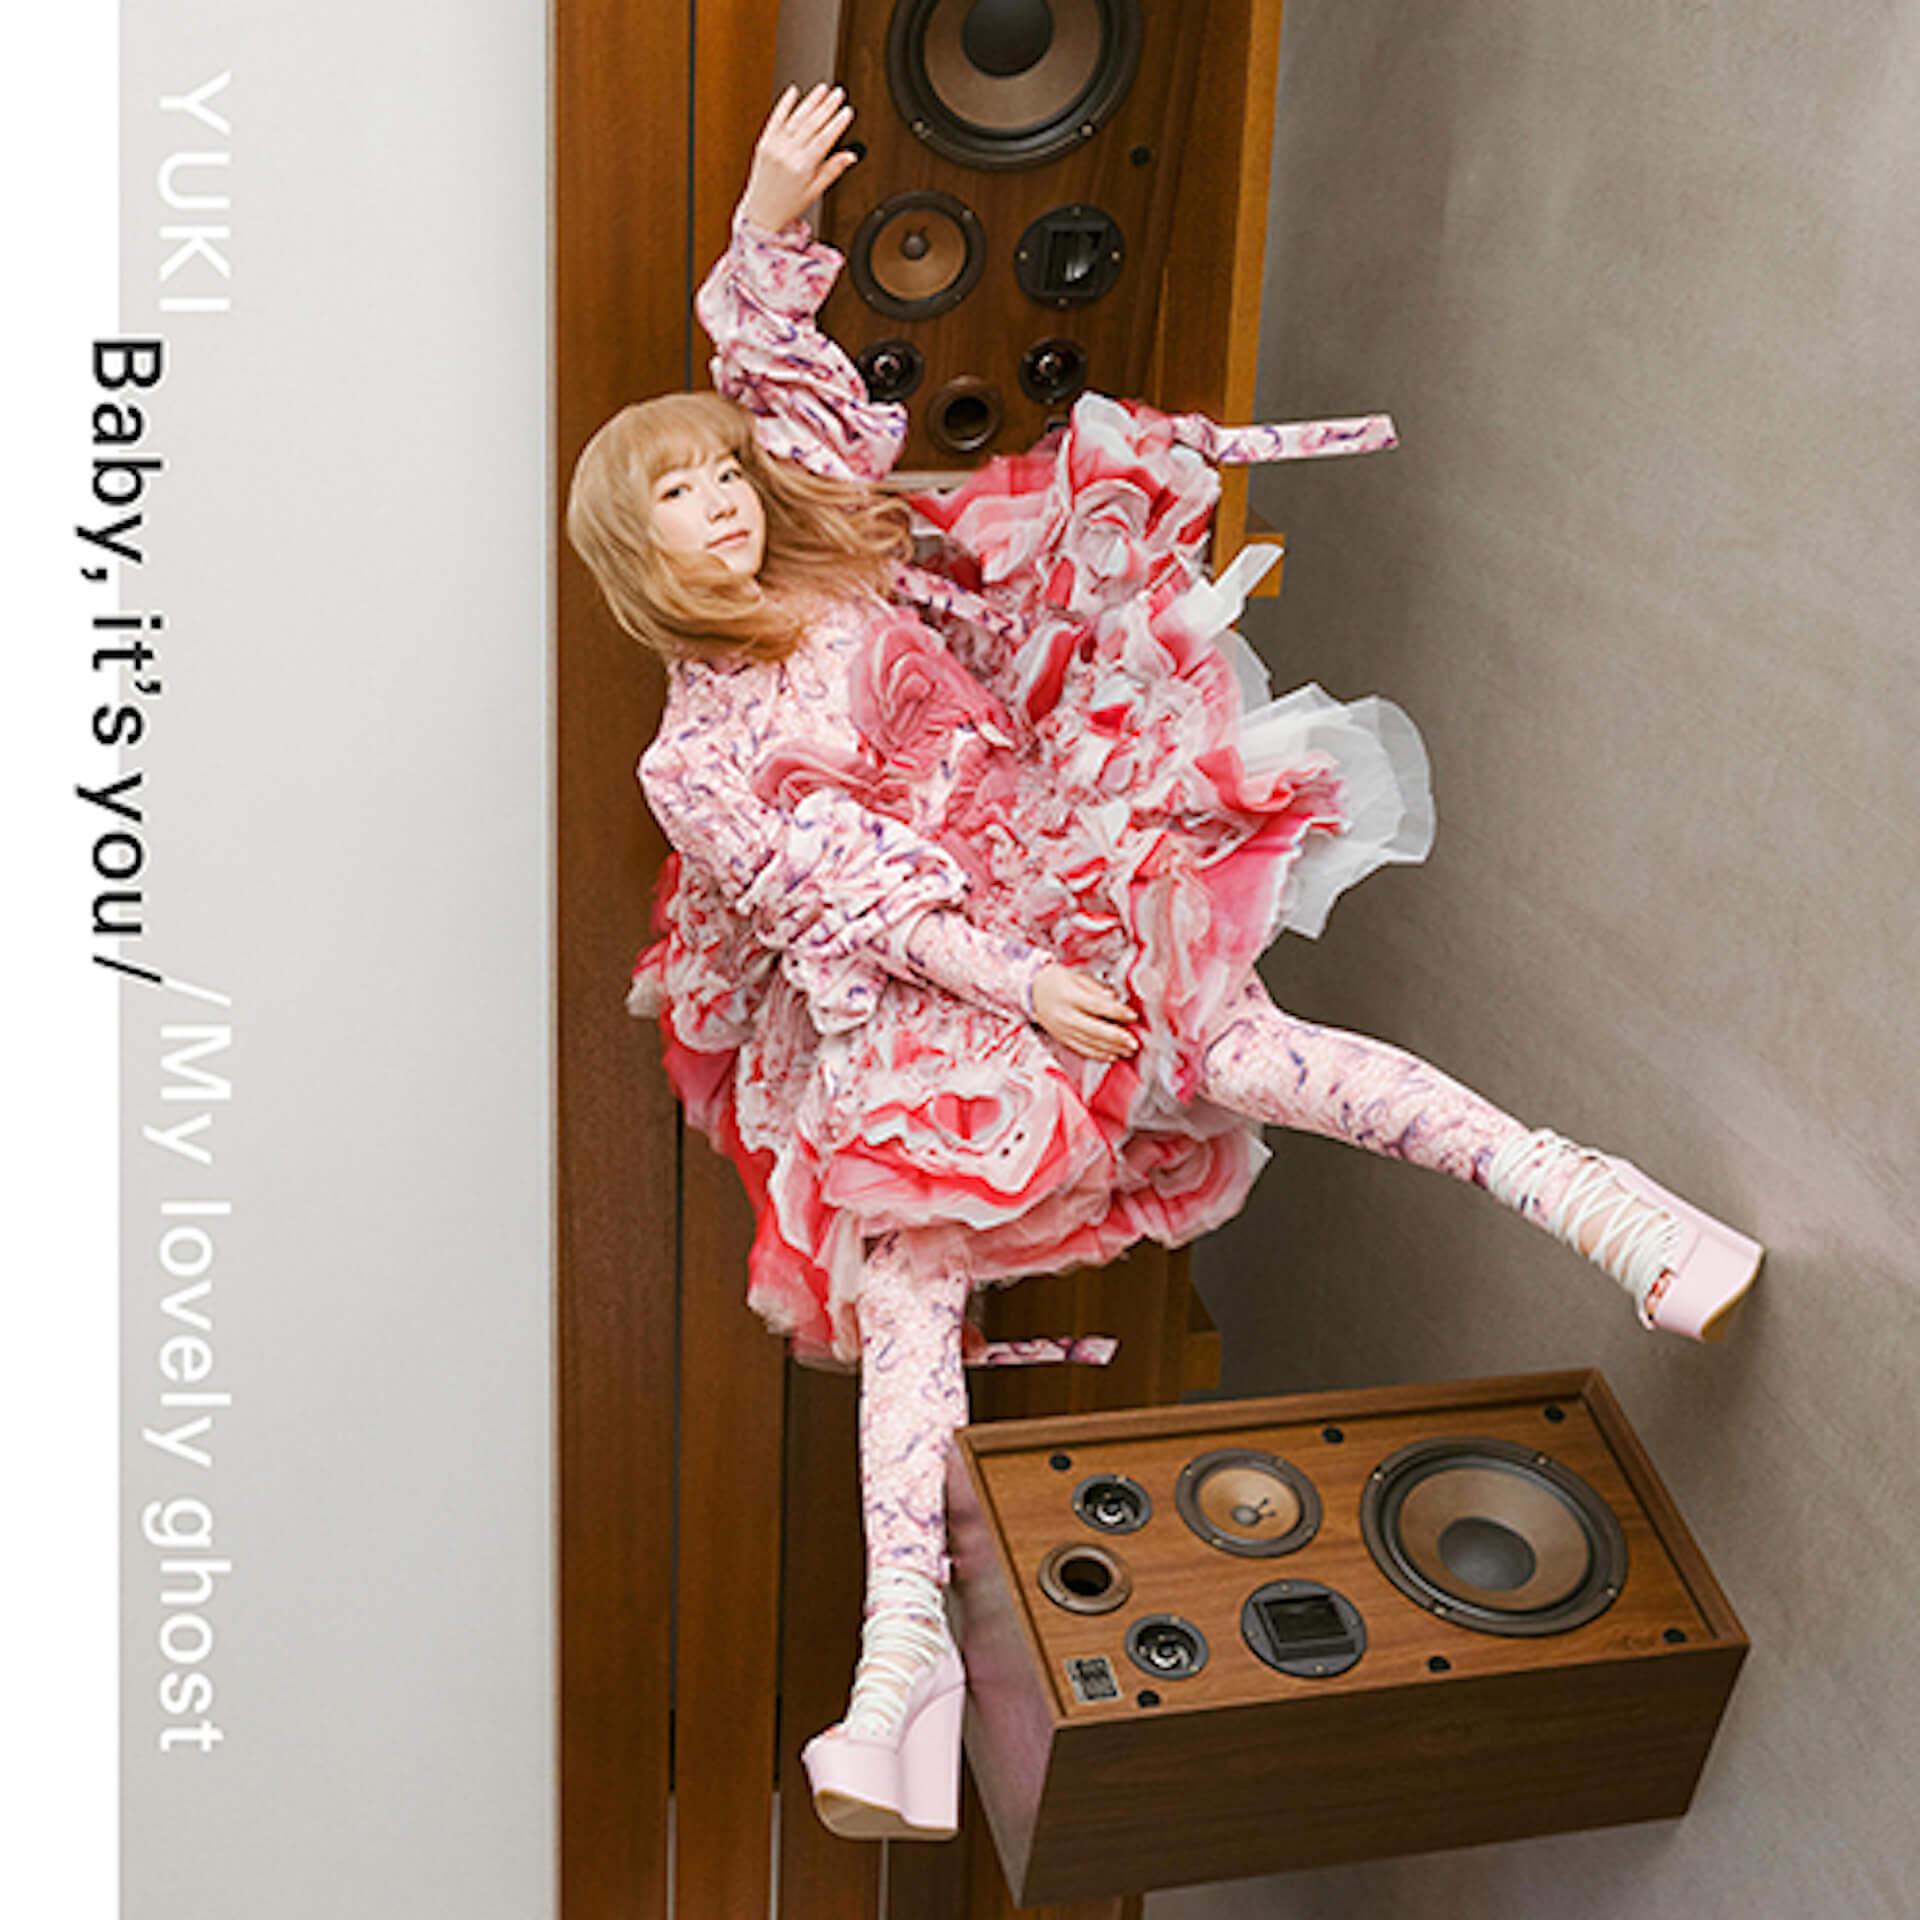 "YUKIのニューシングル『Baby, it's you / My lovely ghost』の""Baby, it's you""ティザー映像が解禁!観覧車に乗るYUKIに注目 music210317_yuki_mv_3"